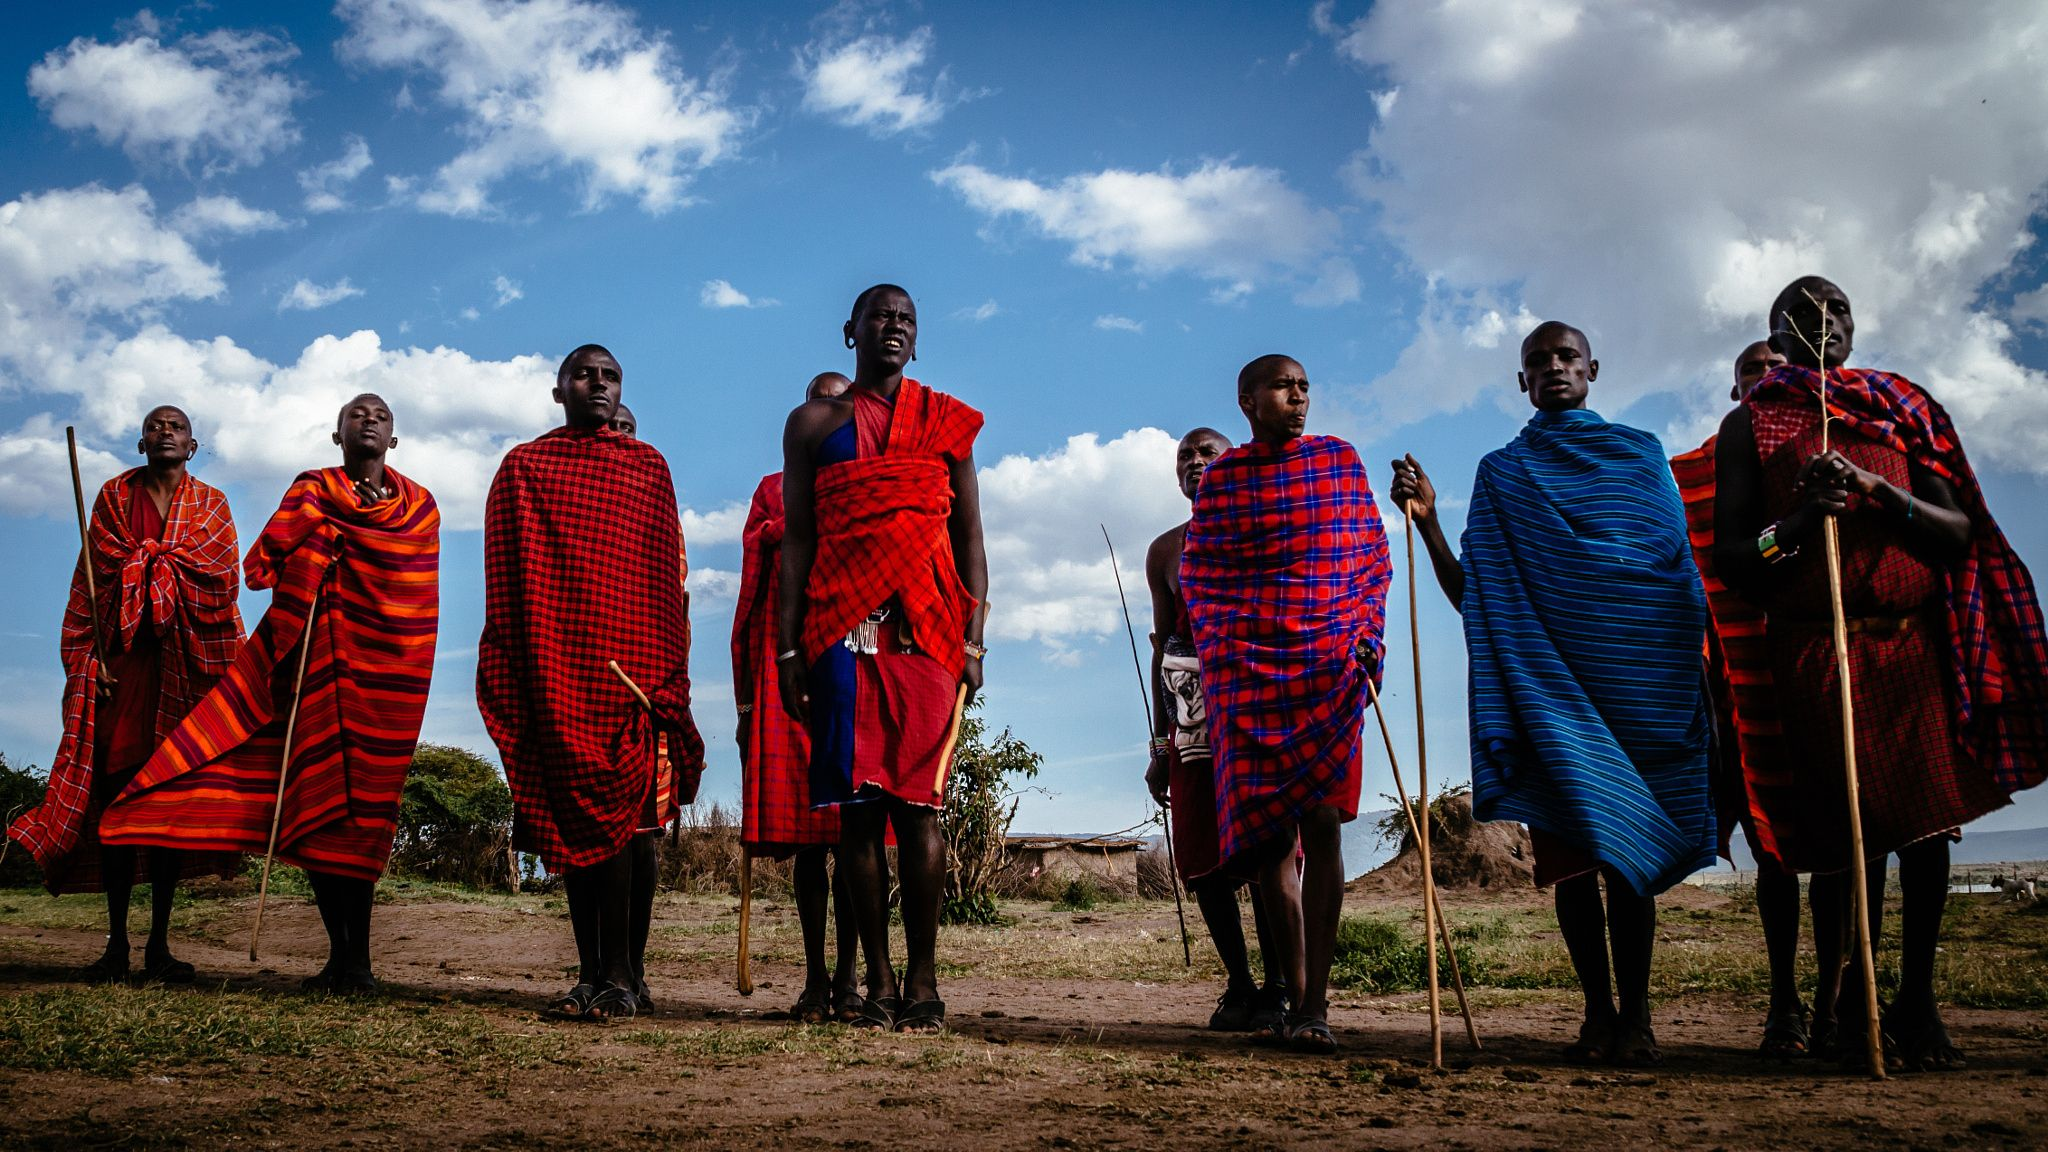 Photograph Maasai Tribe by Siping Ji on 500px